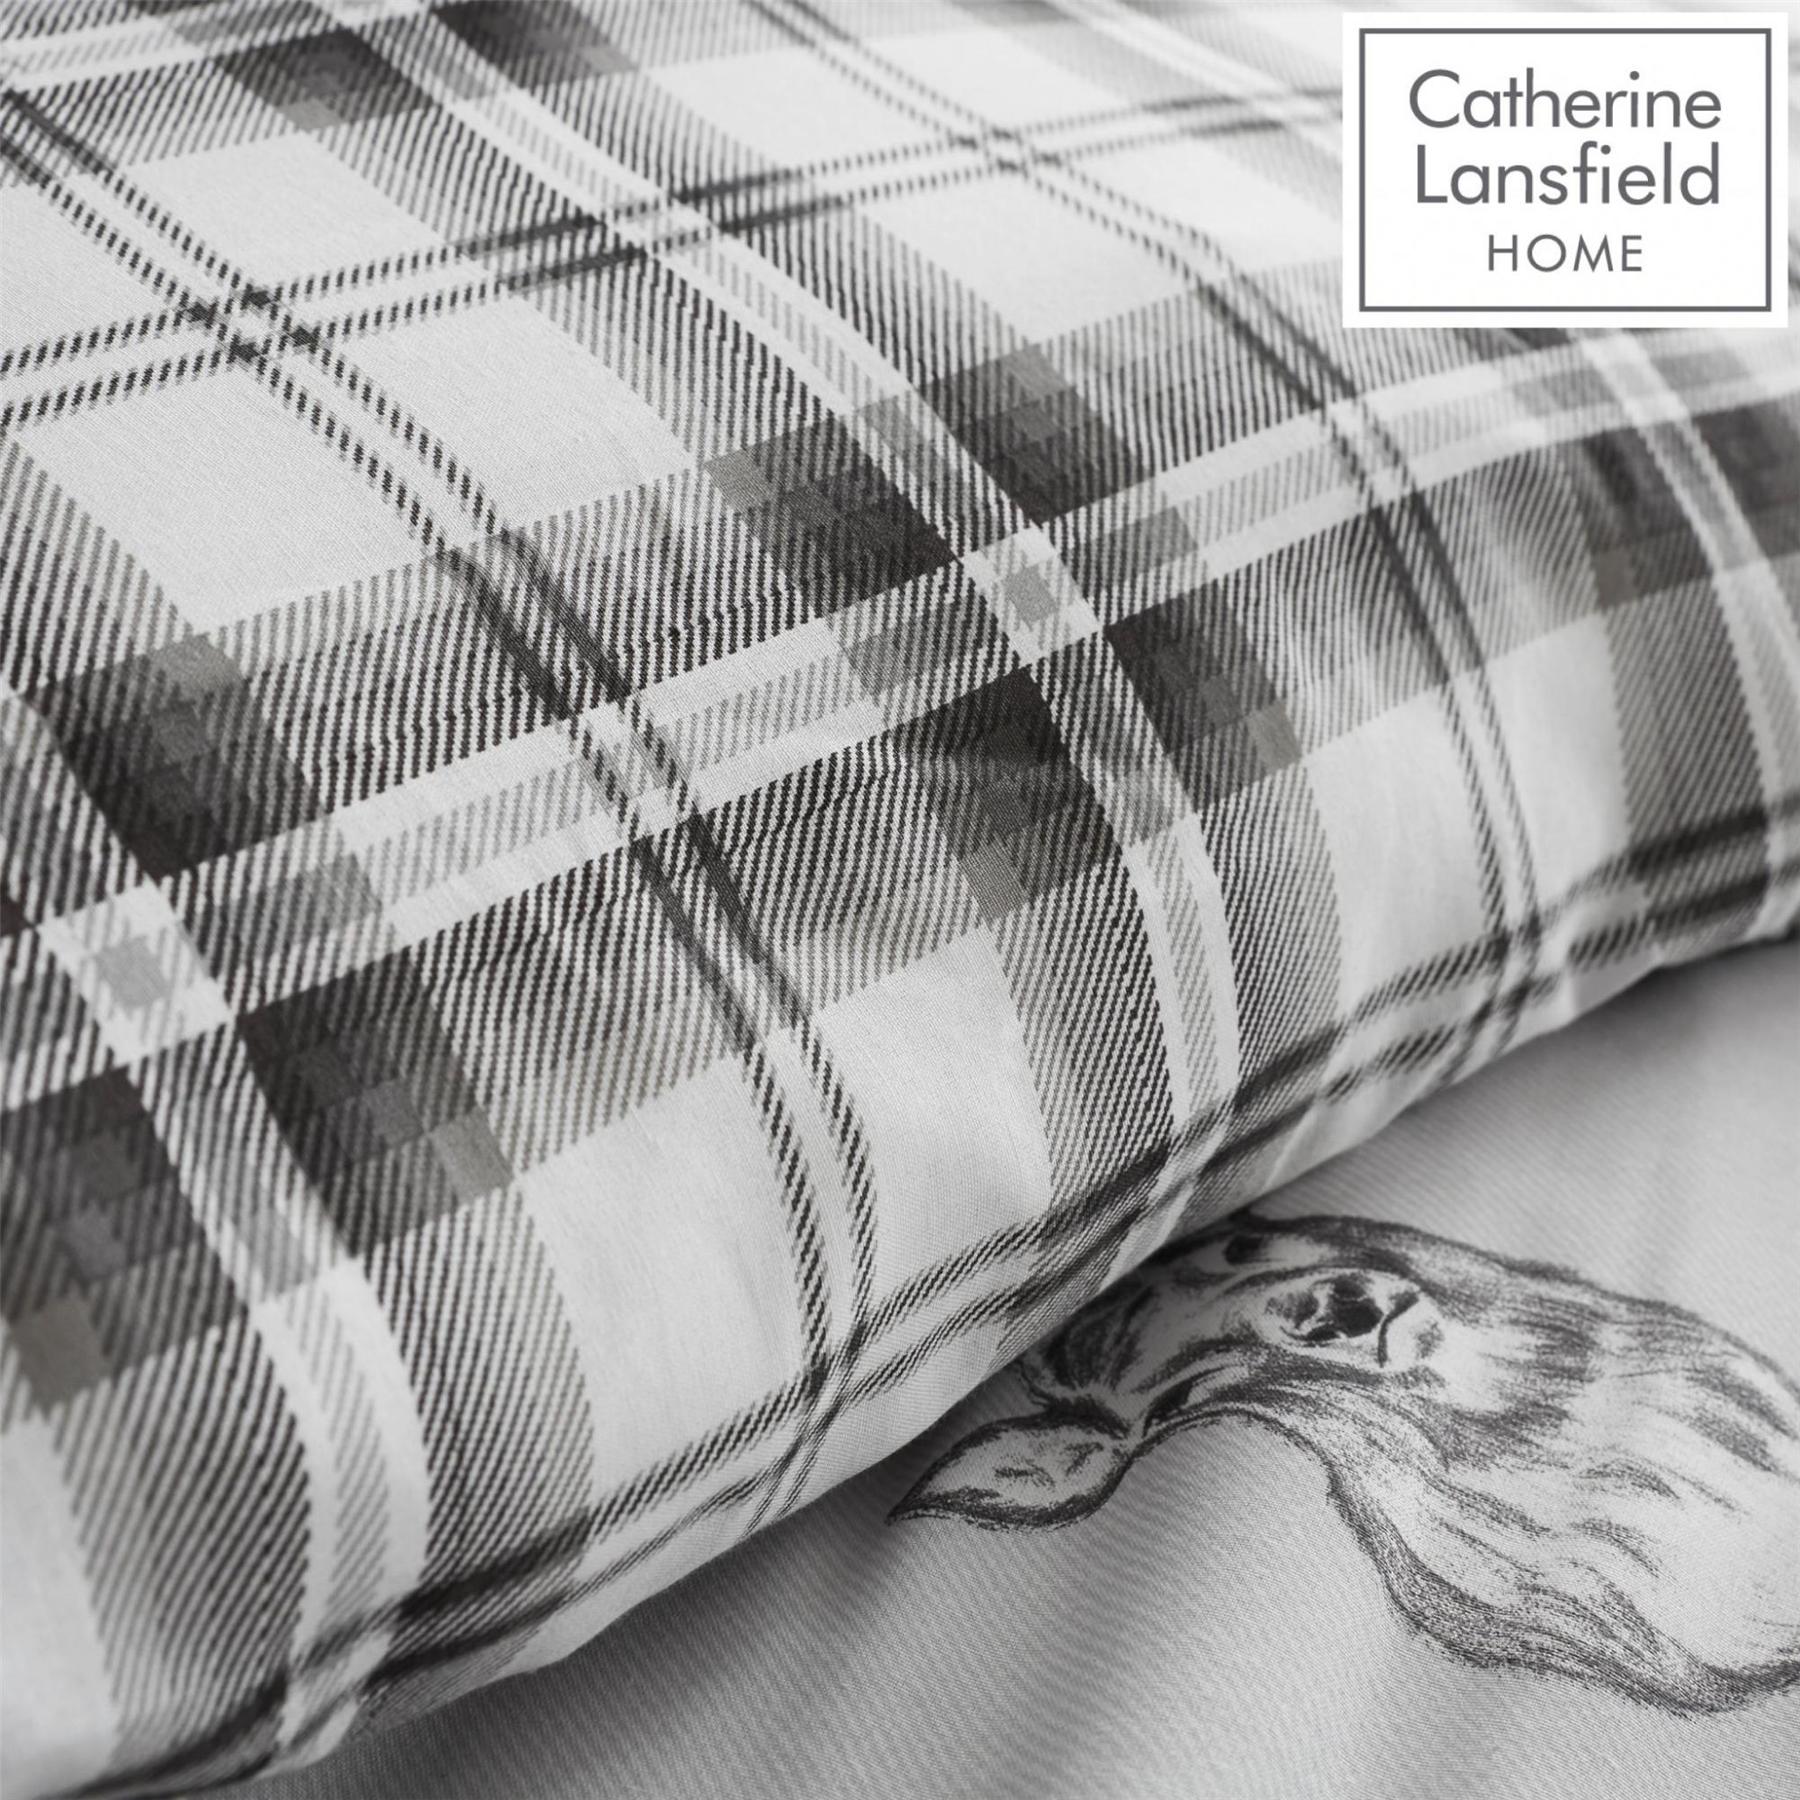 Catherine-Lansfield-Duvet-Set-Highland-Stag-Reversible-Check-Bedding-Grey thumbnail 28